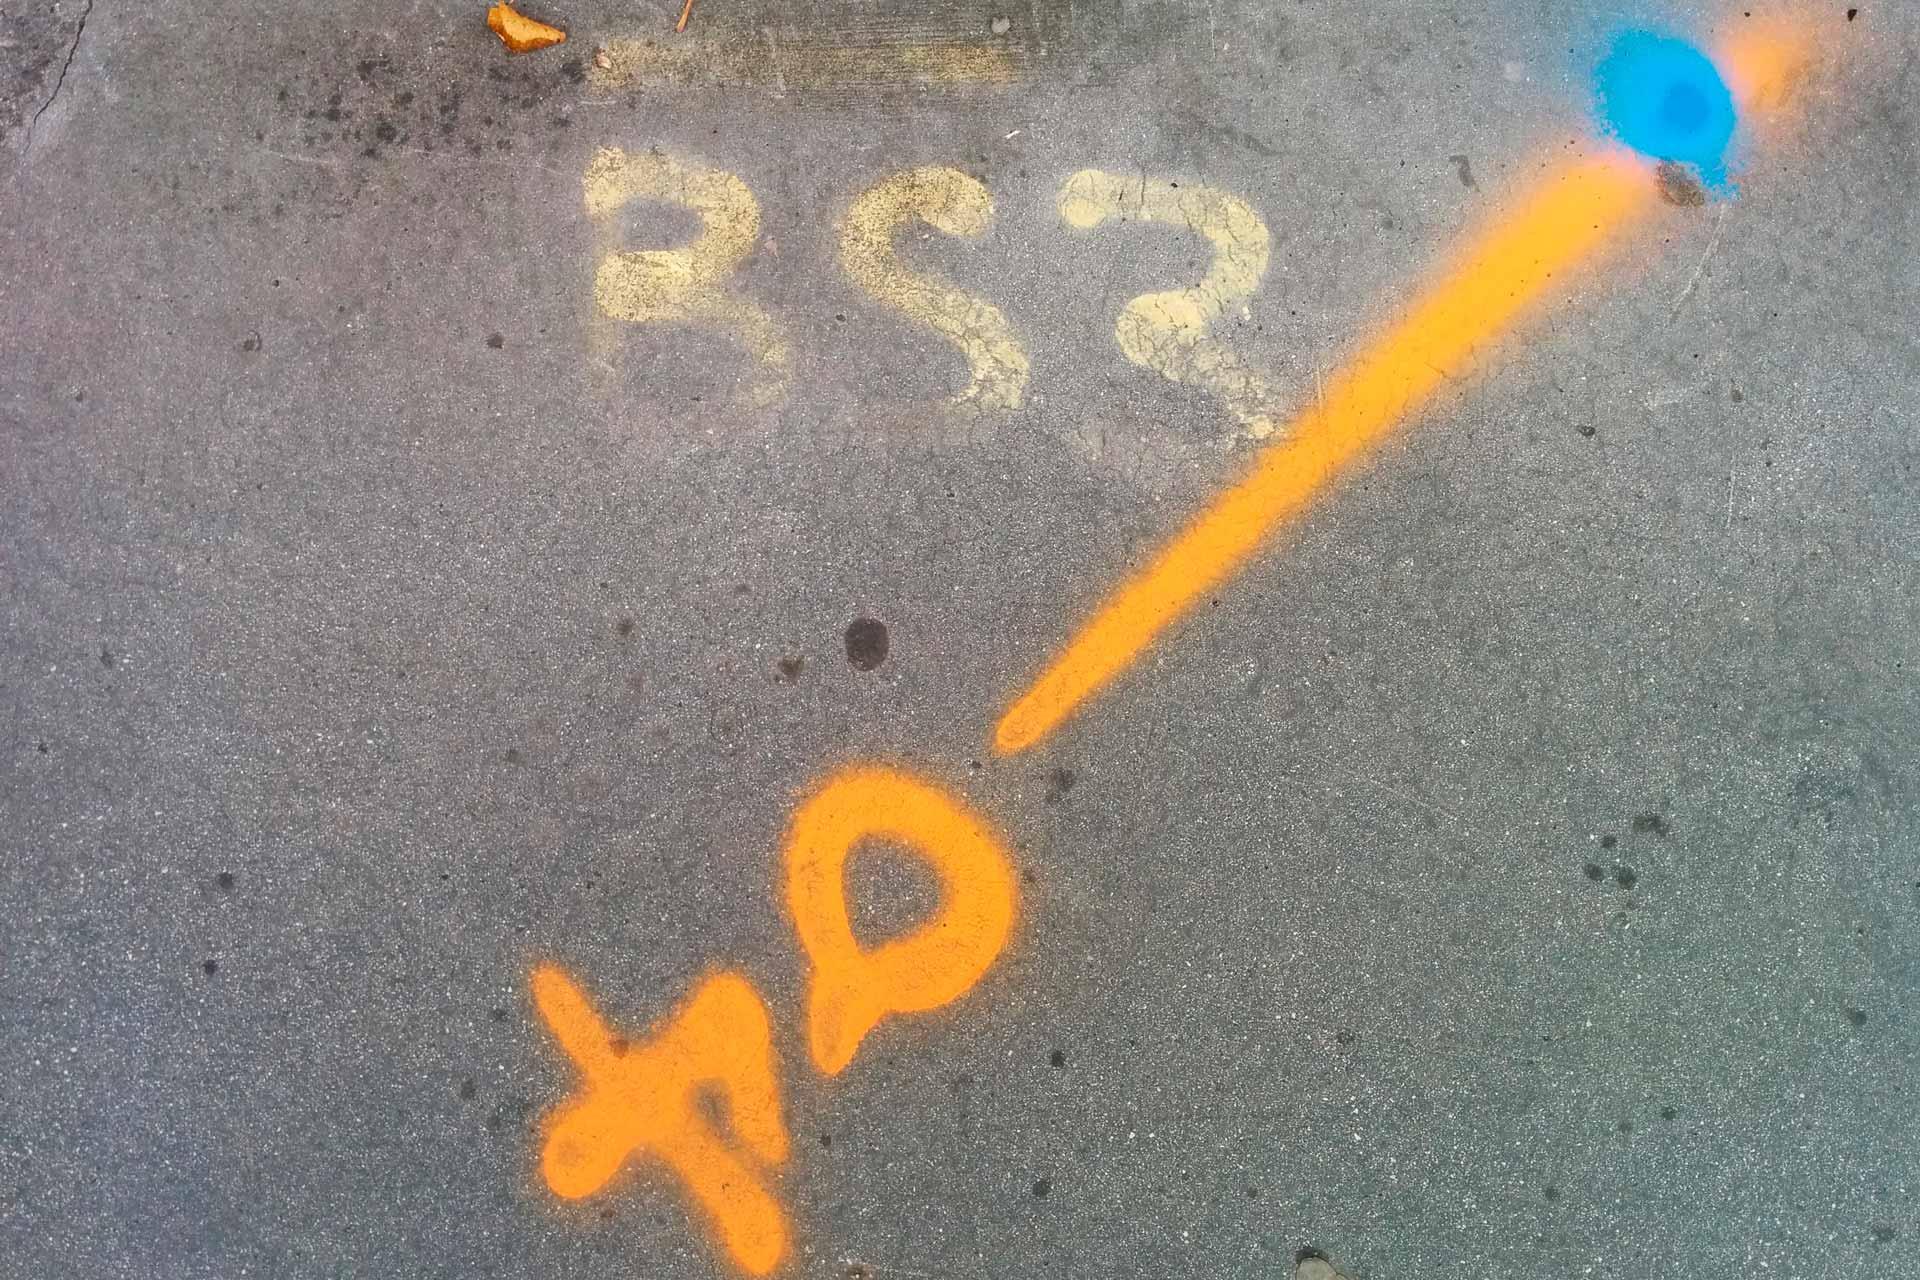 Street-markings_image12